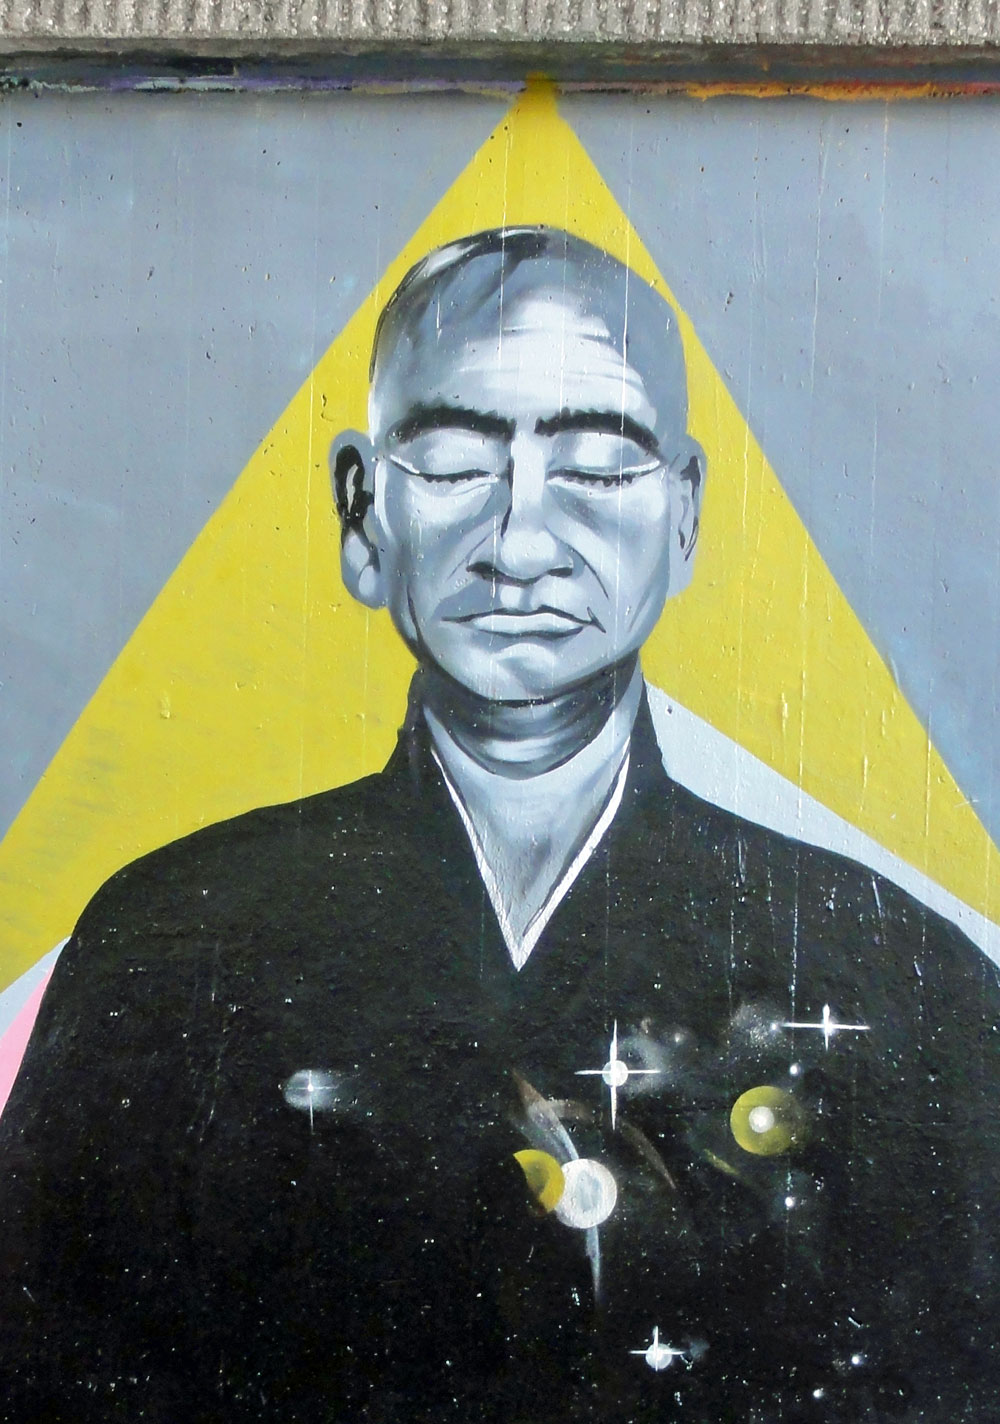 frankfurt-graffiti-ratsweg-hanauer-landstrasse-2016-foto-065-jens-shoshin